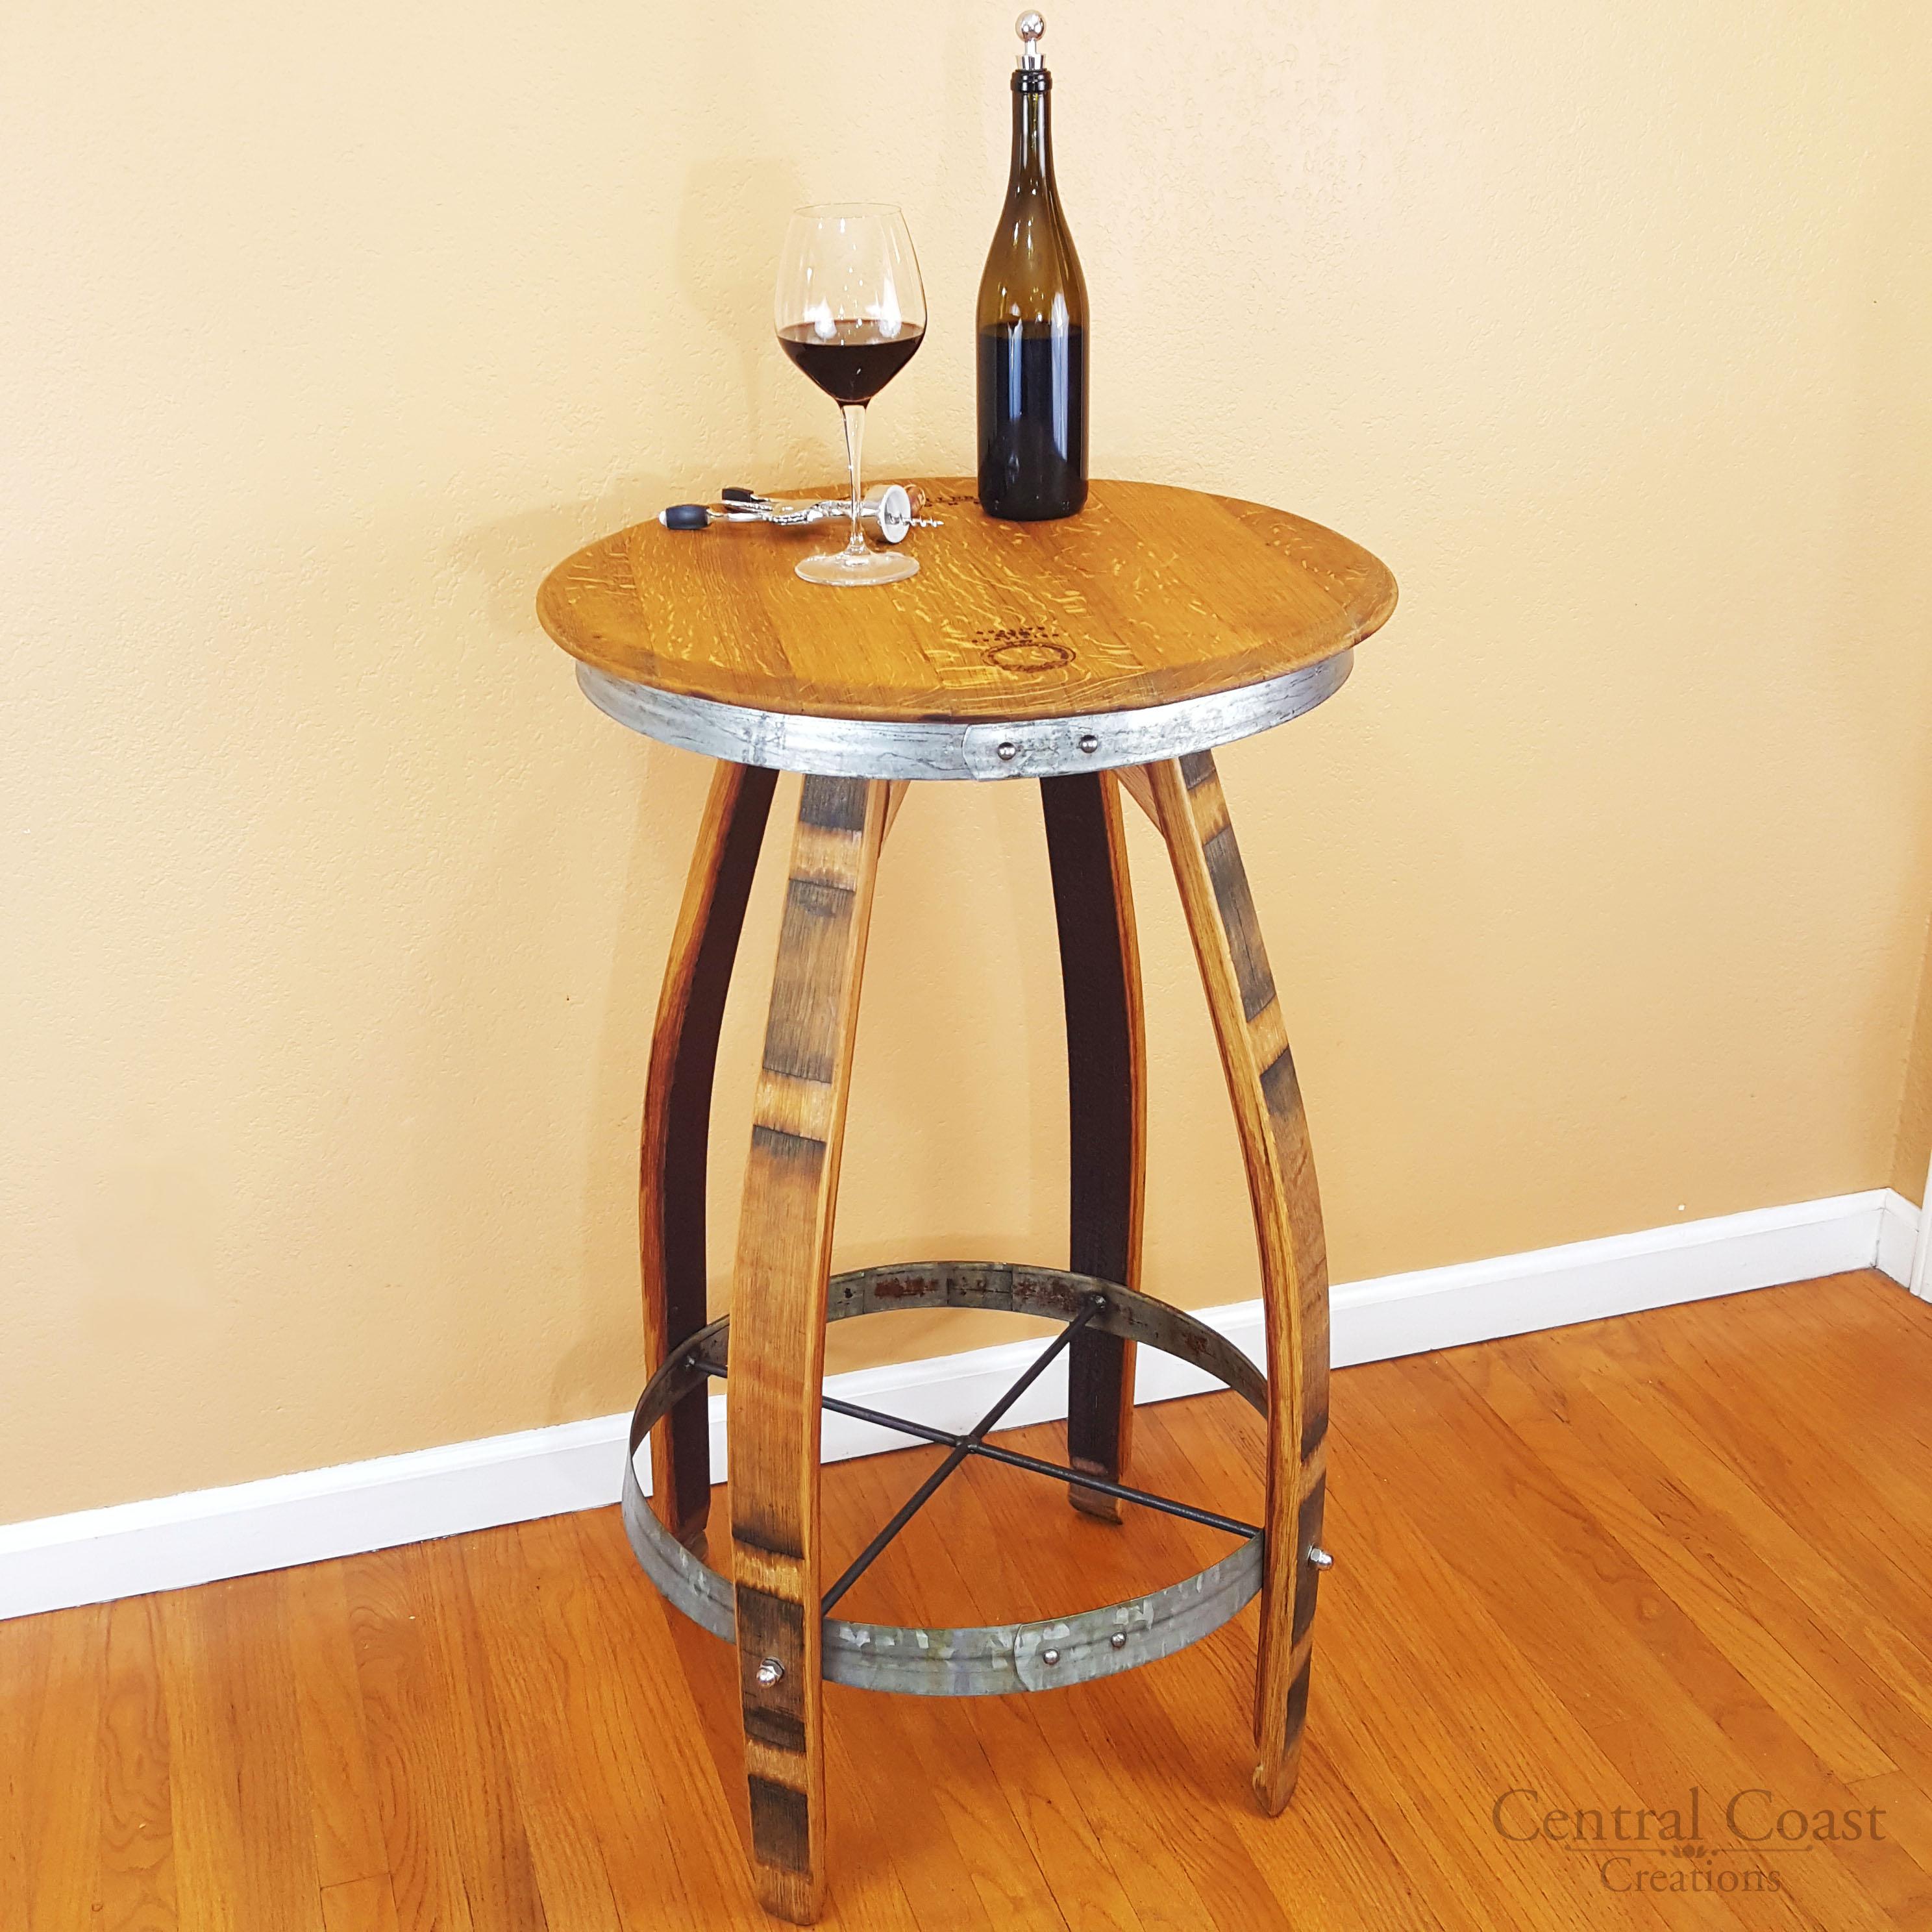 Wine Barrel Pub Table - Central Coast Creations